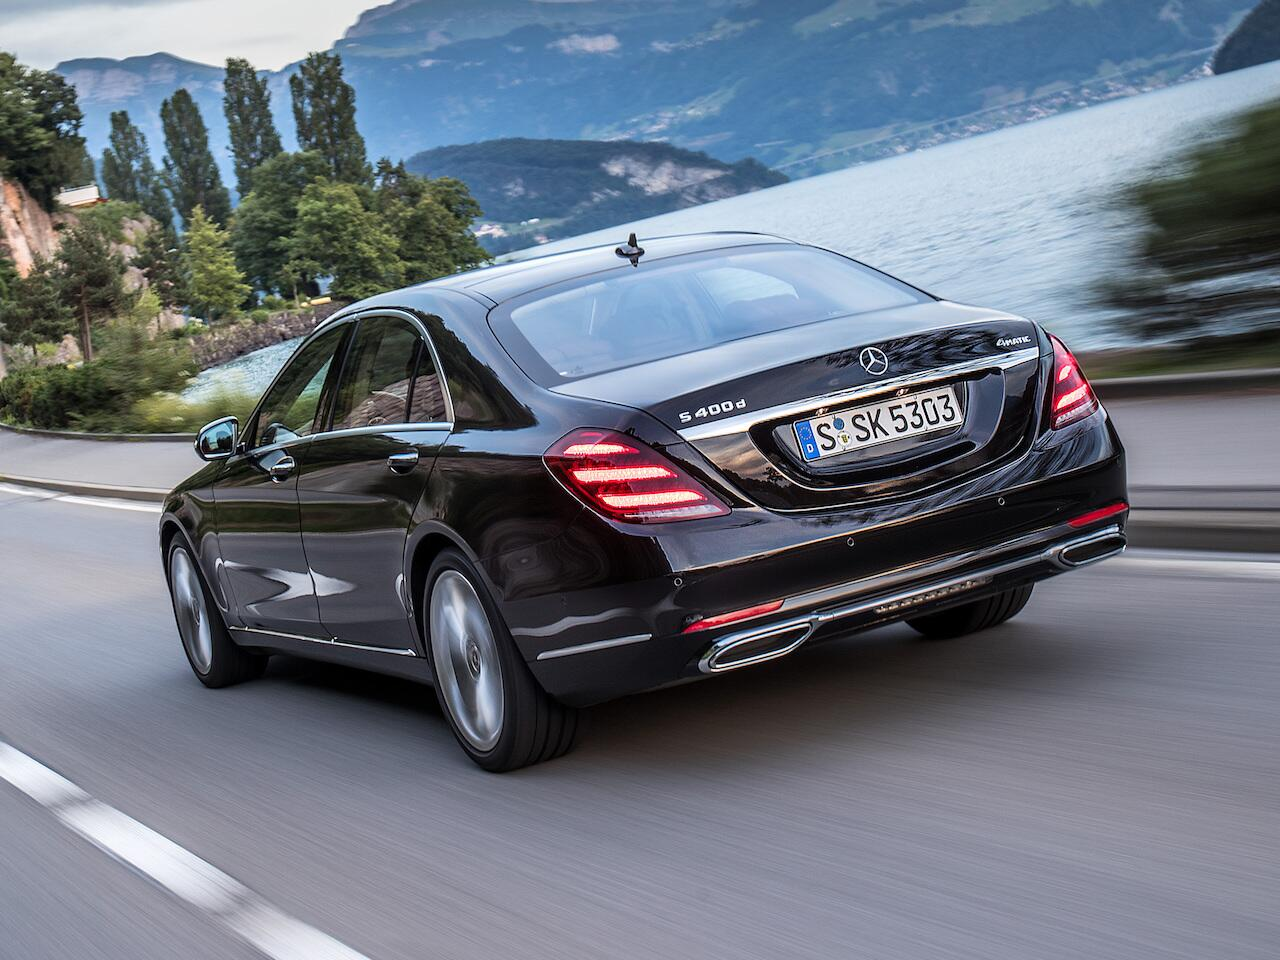 Bild zu Platz 1: Mercedes-Benz S-Klasse